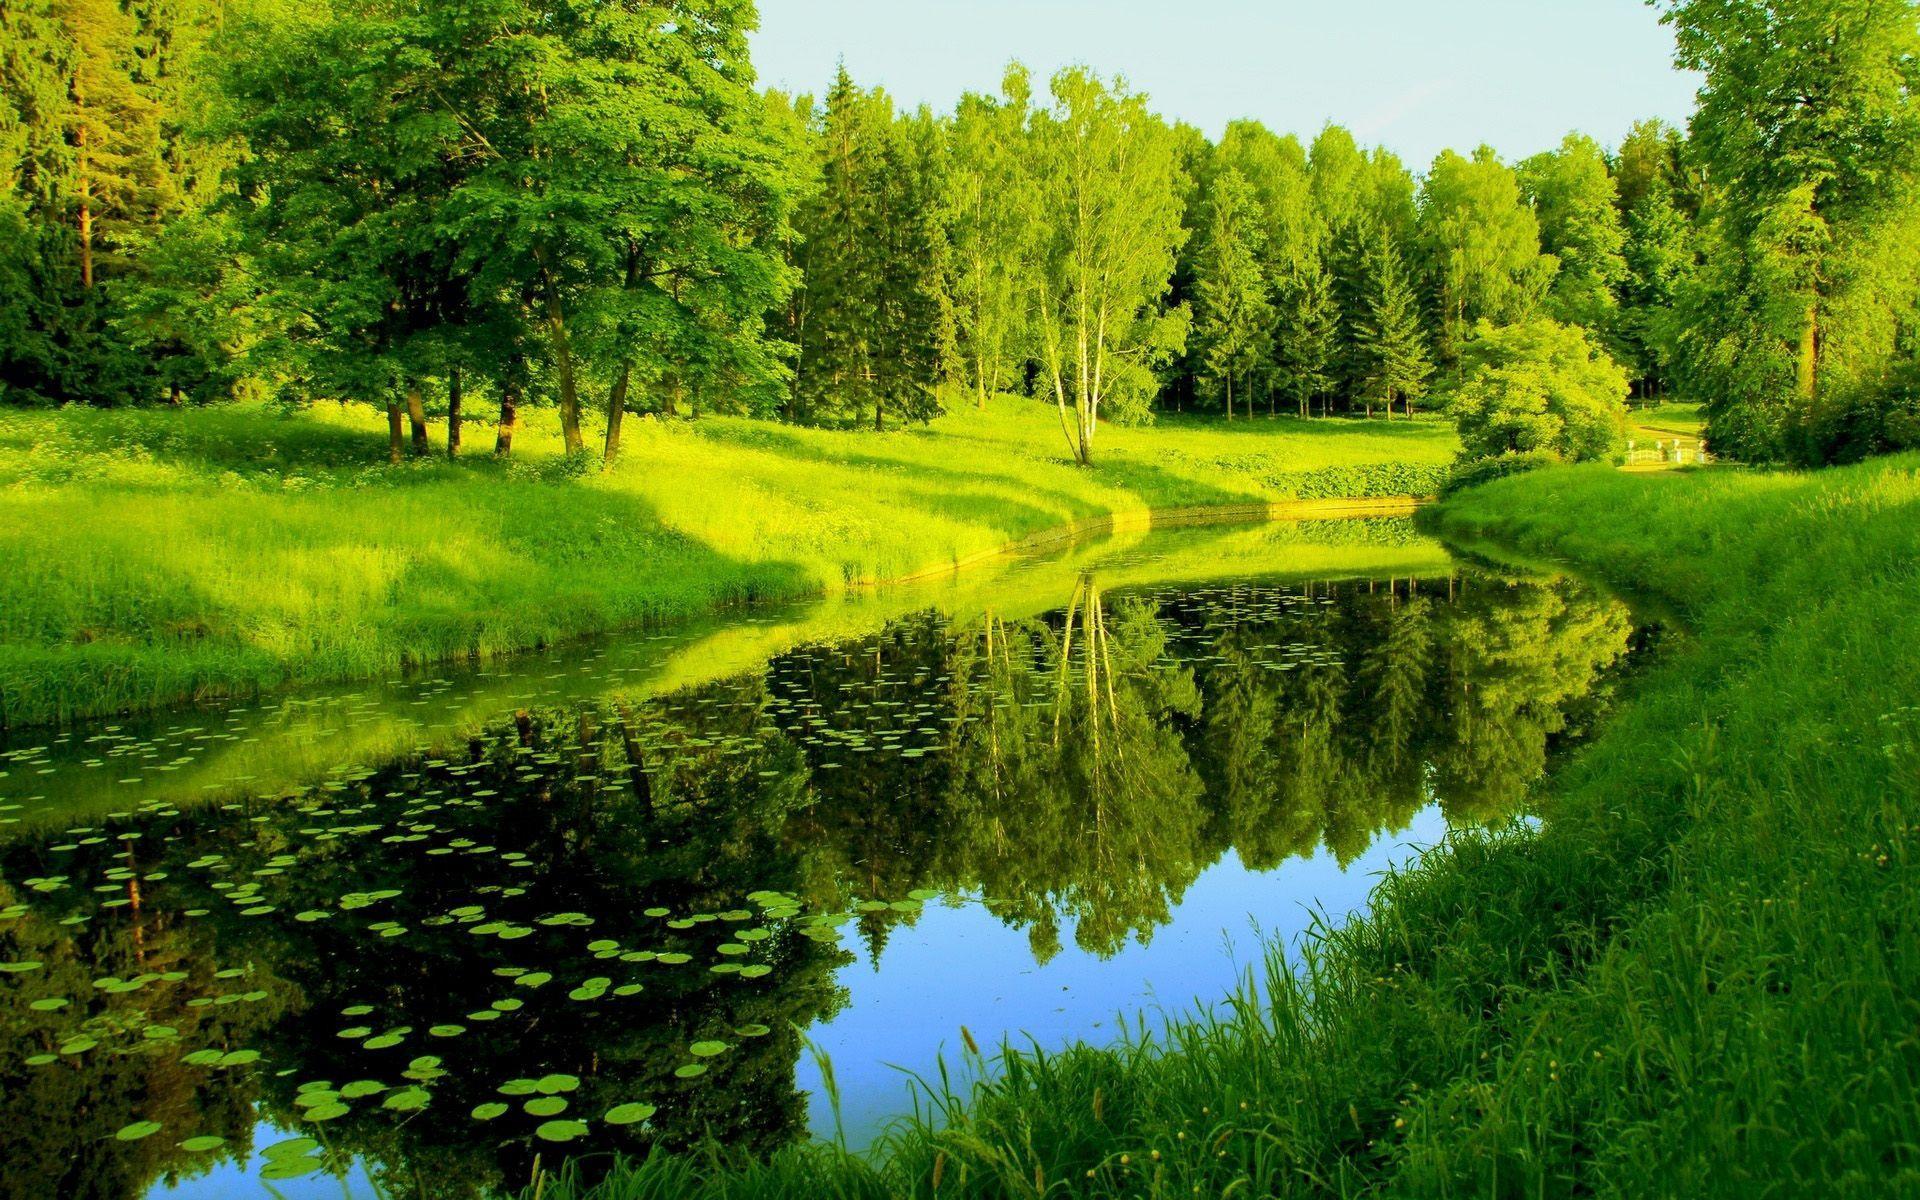 Green Landscape Wallpapers Top Free Green Landscape Backgrounds Wallpaperaccess